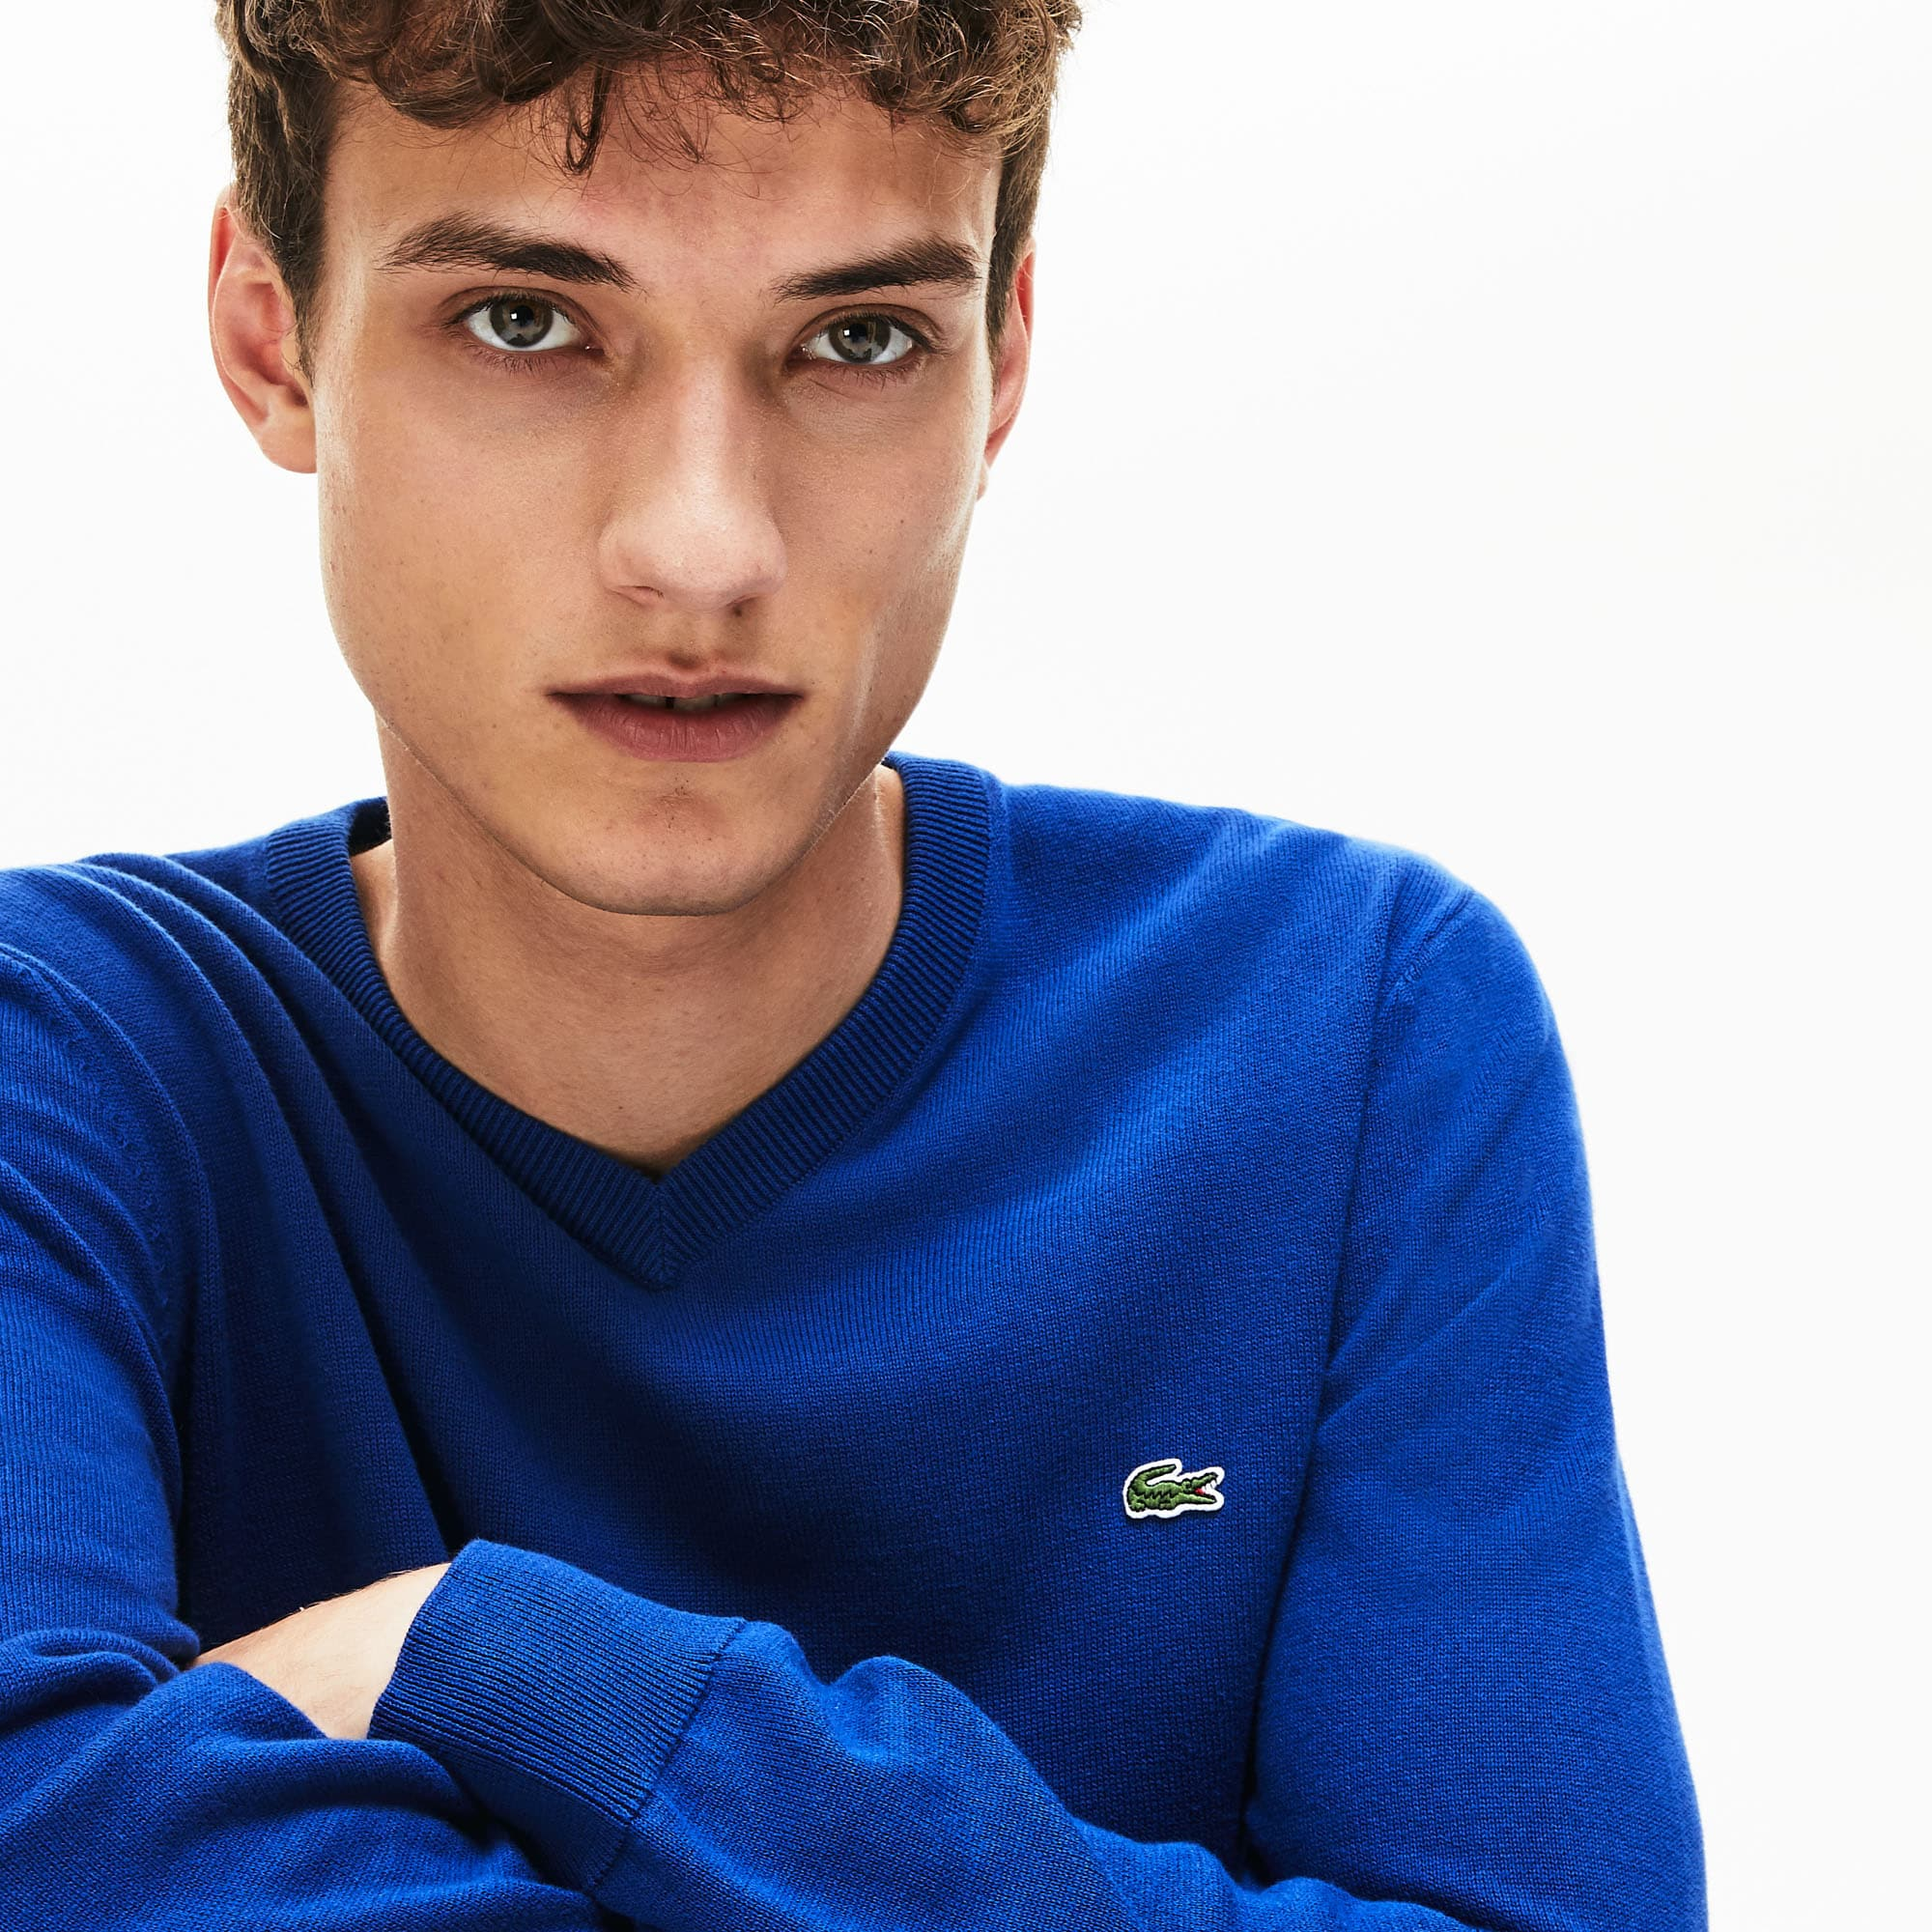 Lacoste Jewelry Men's V-neck Caviar Piqué Accent Cotton Jersey Sweater